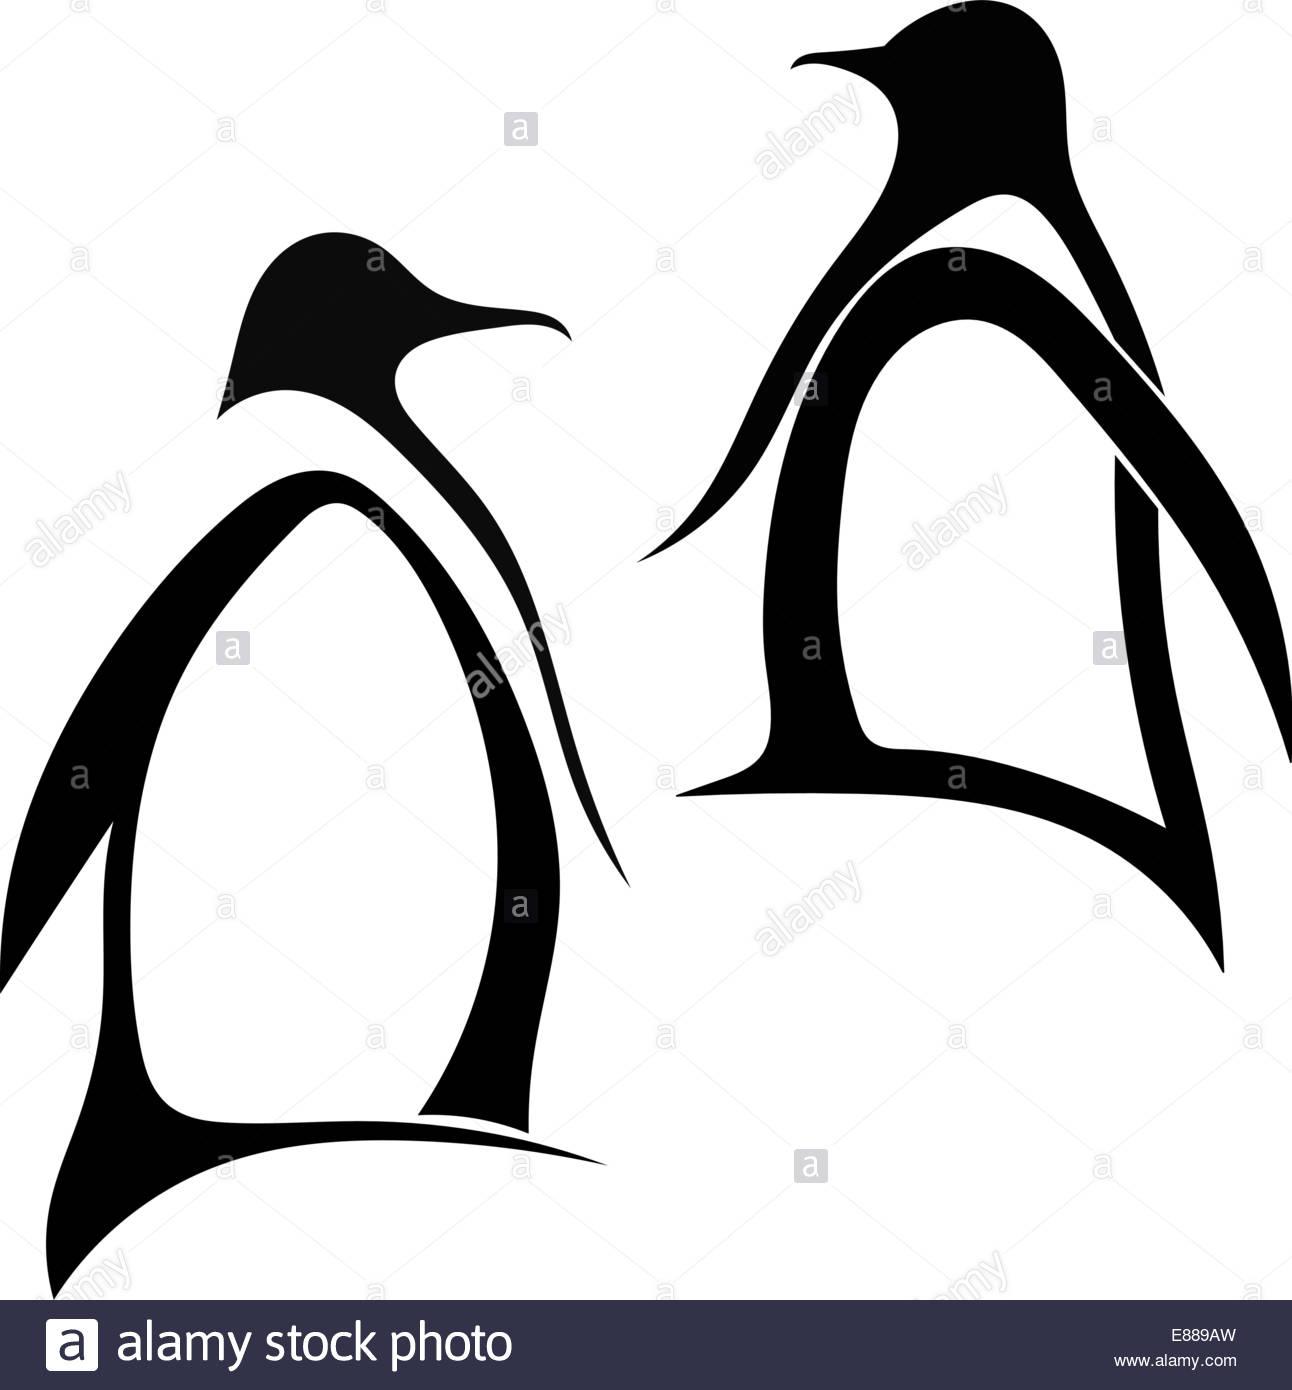 1292x1390 Two Silhouette Of Penguin Stock Vector Art Amp Illustration, Vector